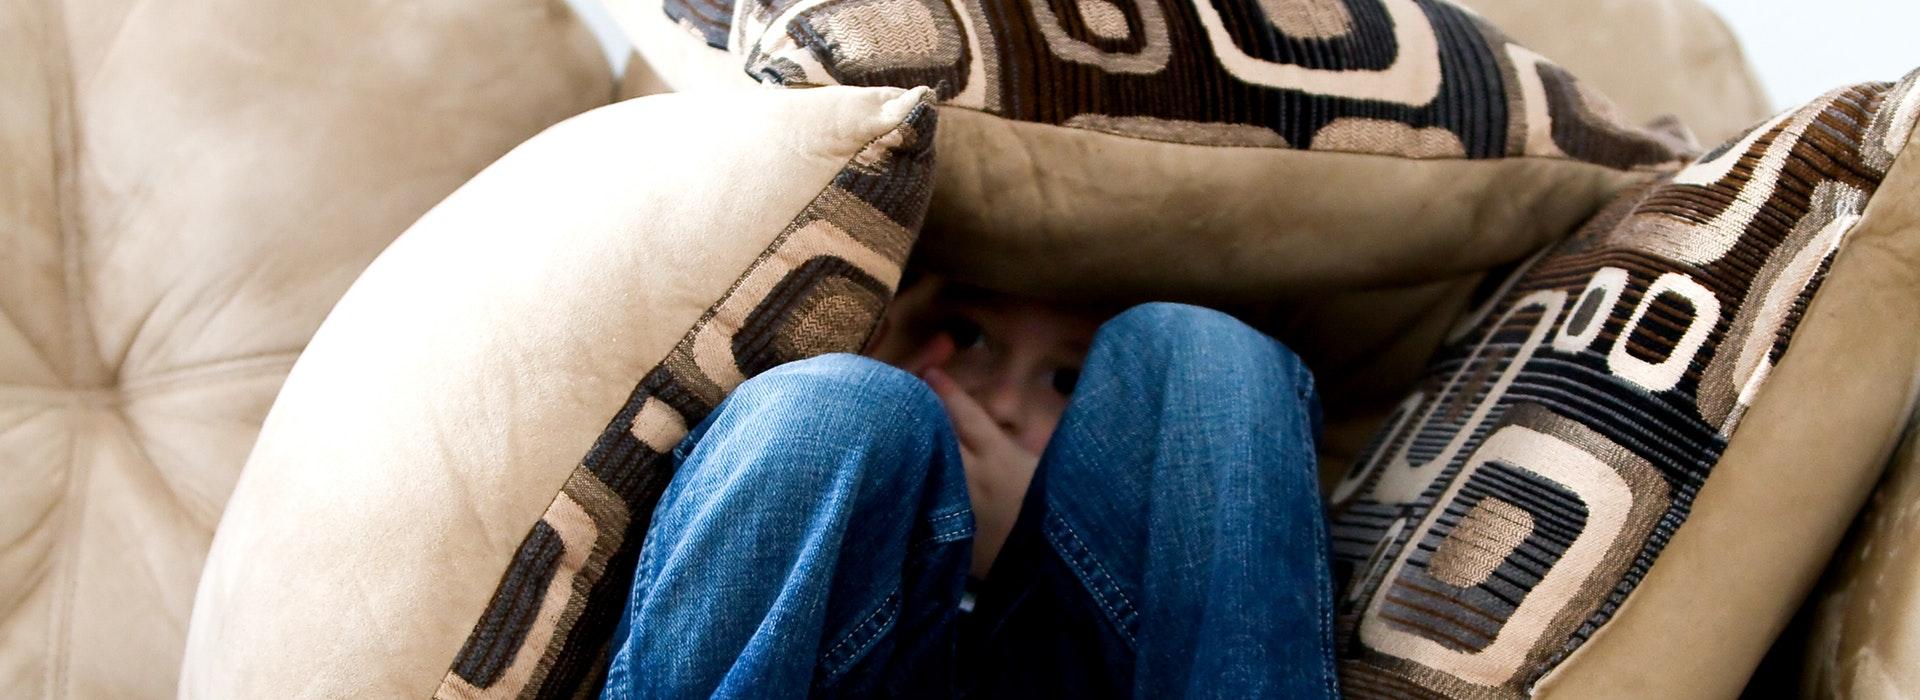 Angst-Panik-verstecken-Sofa